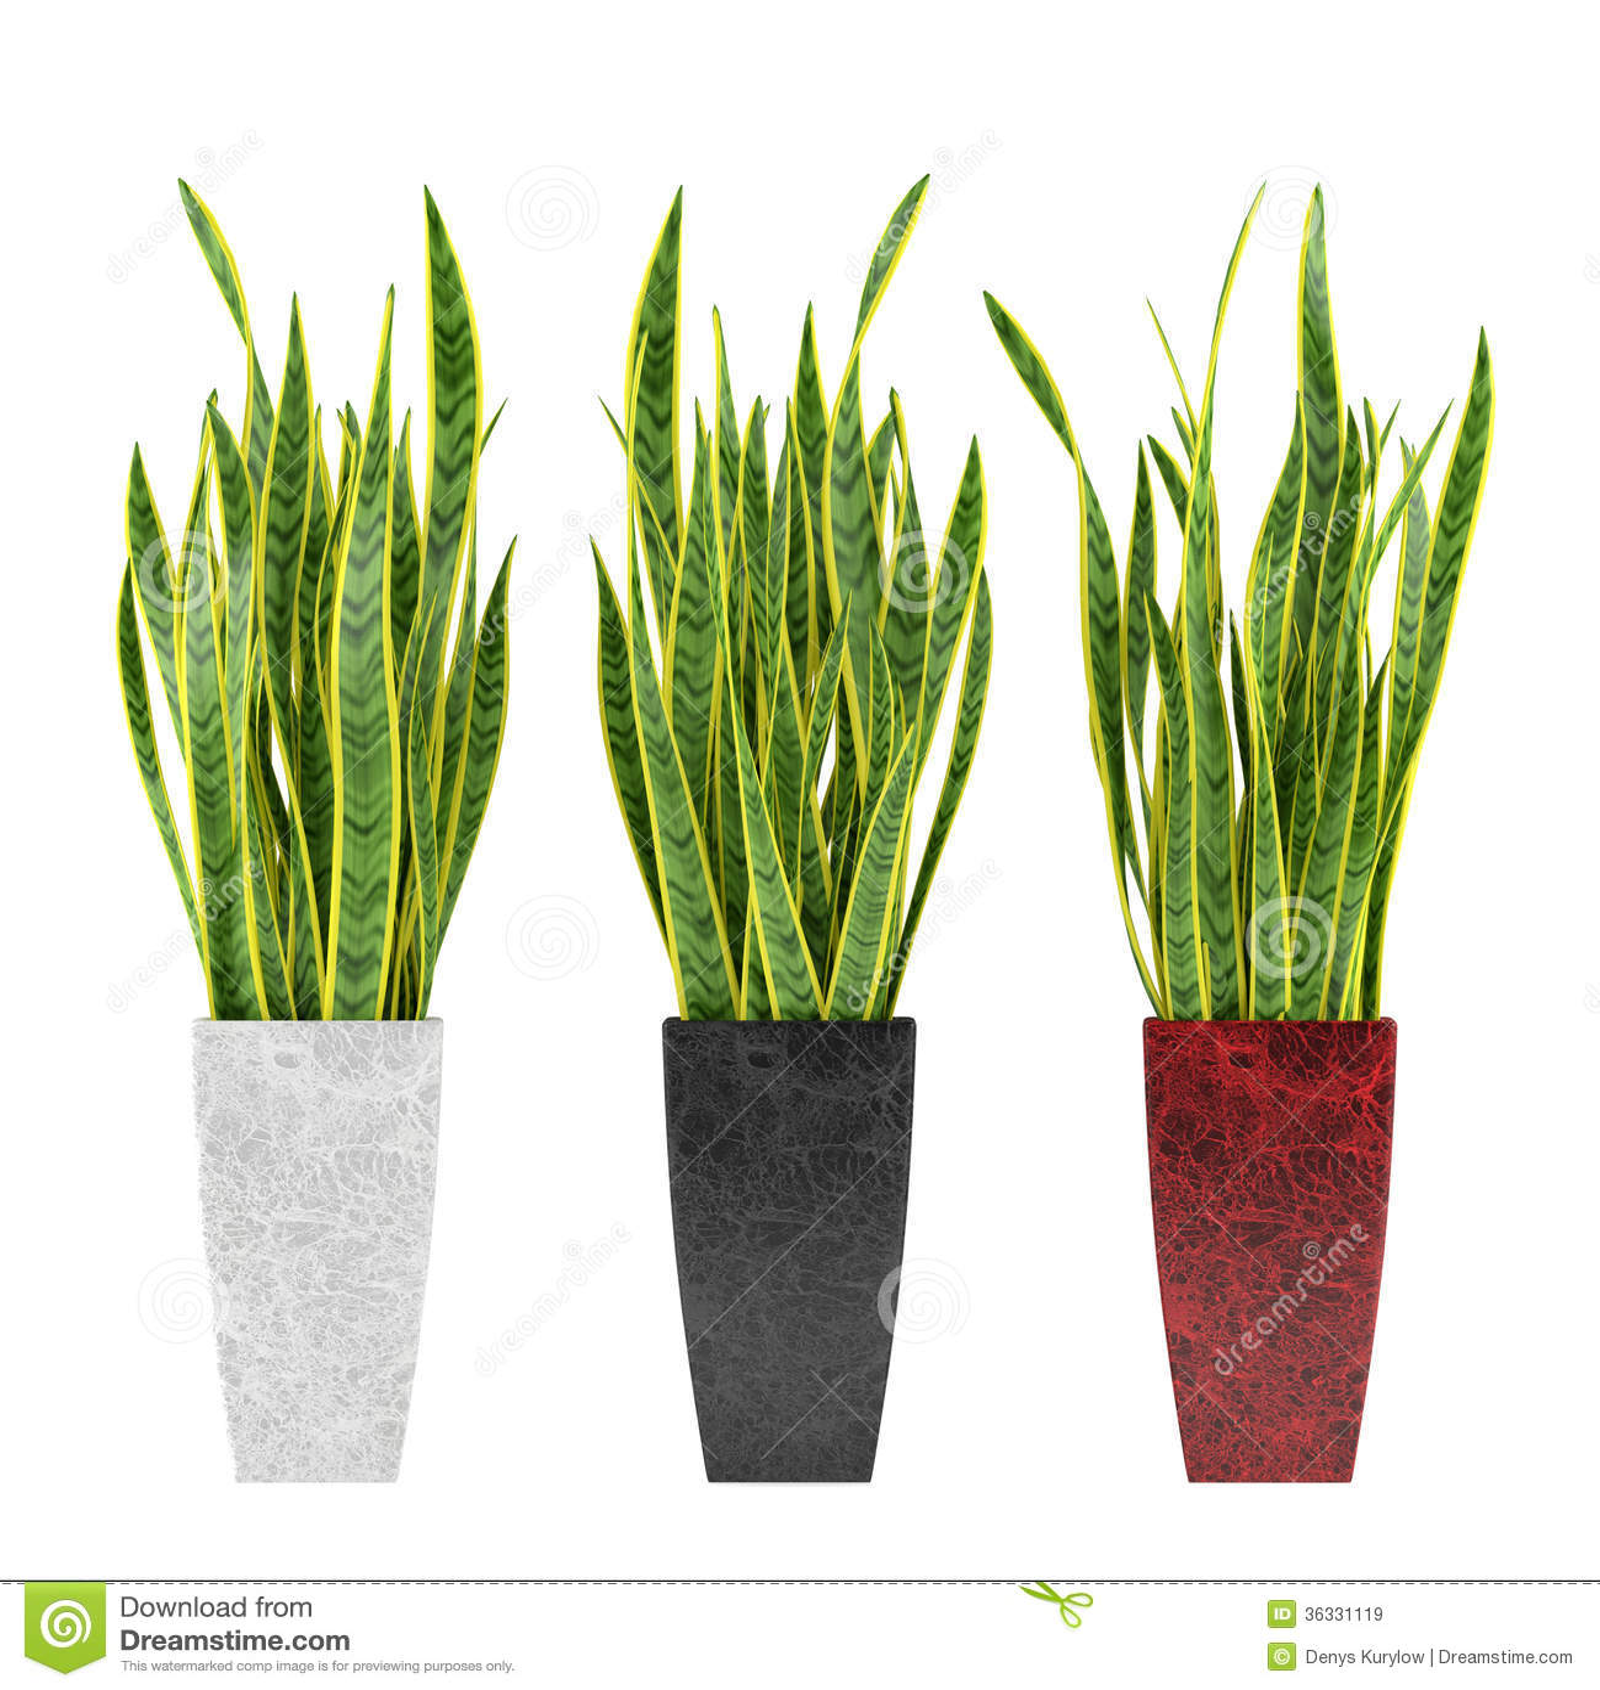 Decorative Grass Plant In Flowerpot Royalty Free Stock